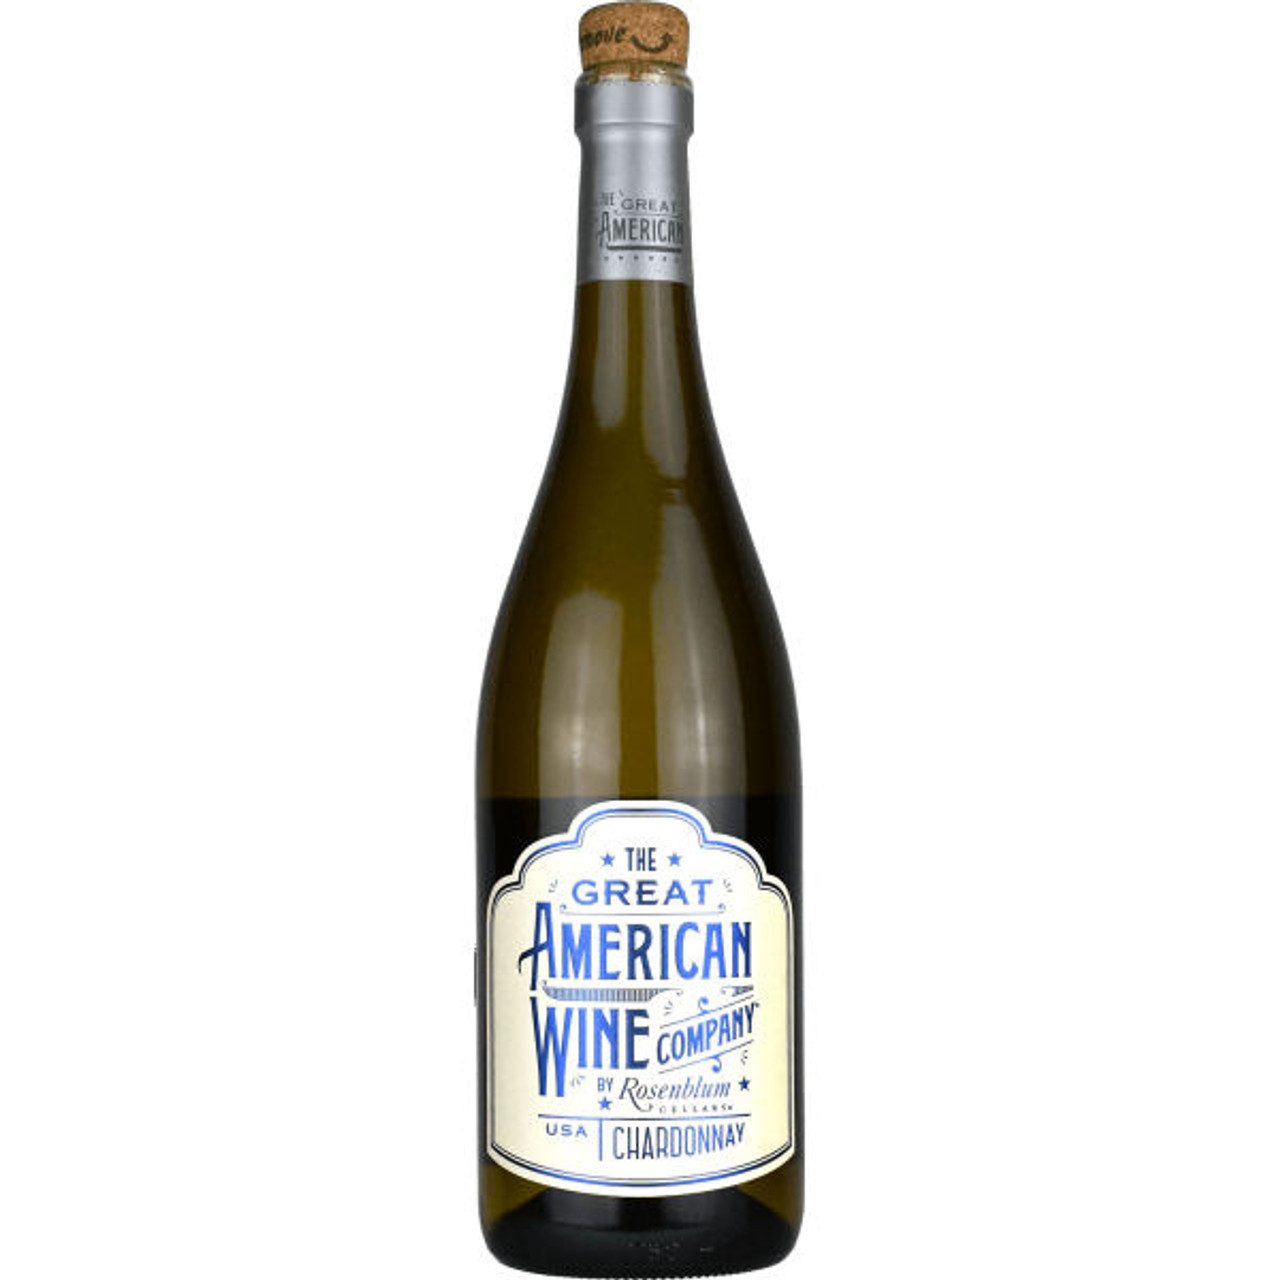 The Great American Wine Company by Rosenblum Chardonnay